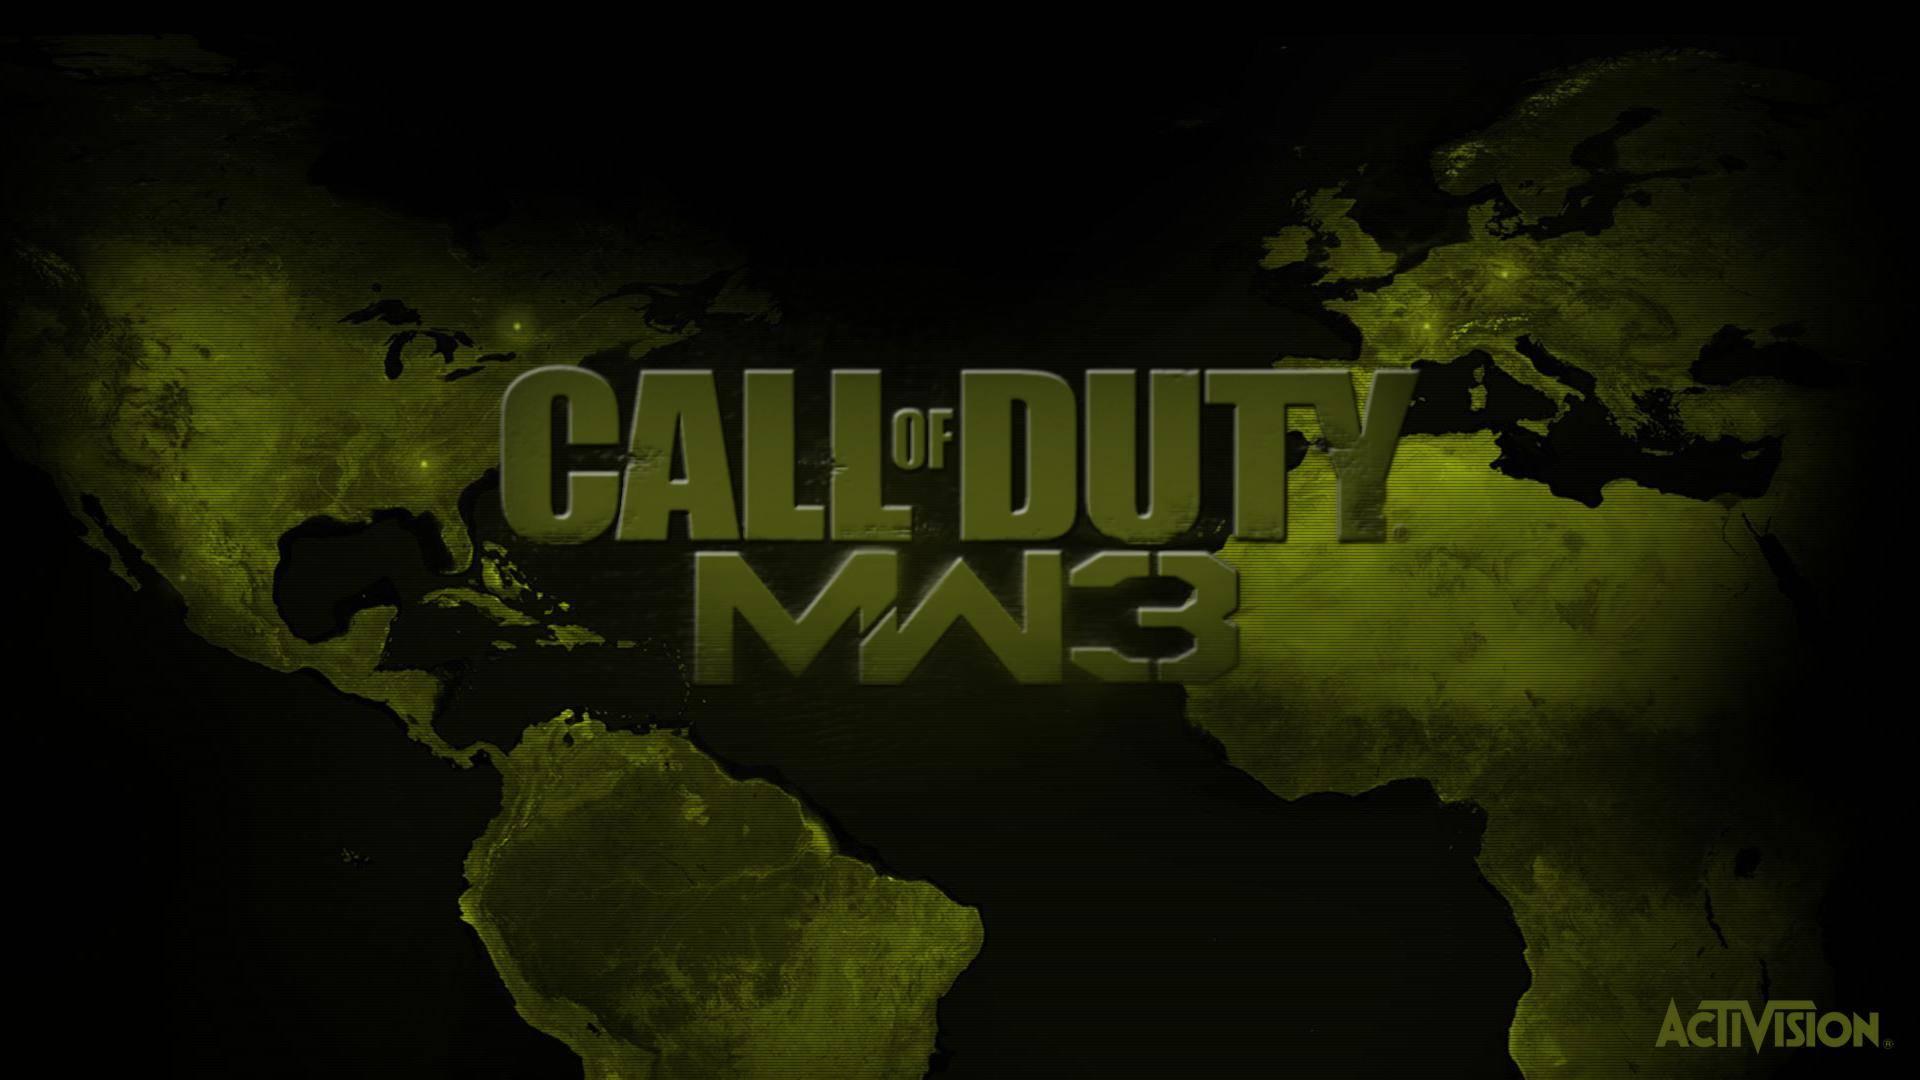 Modern Warfare 3 Wallpapers In 1080p Hd Page 4